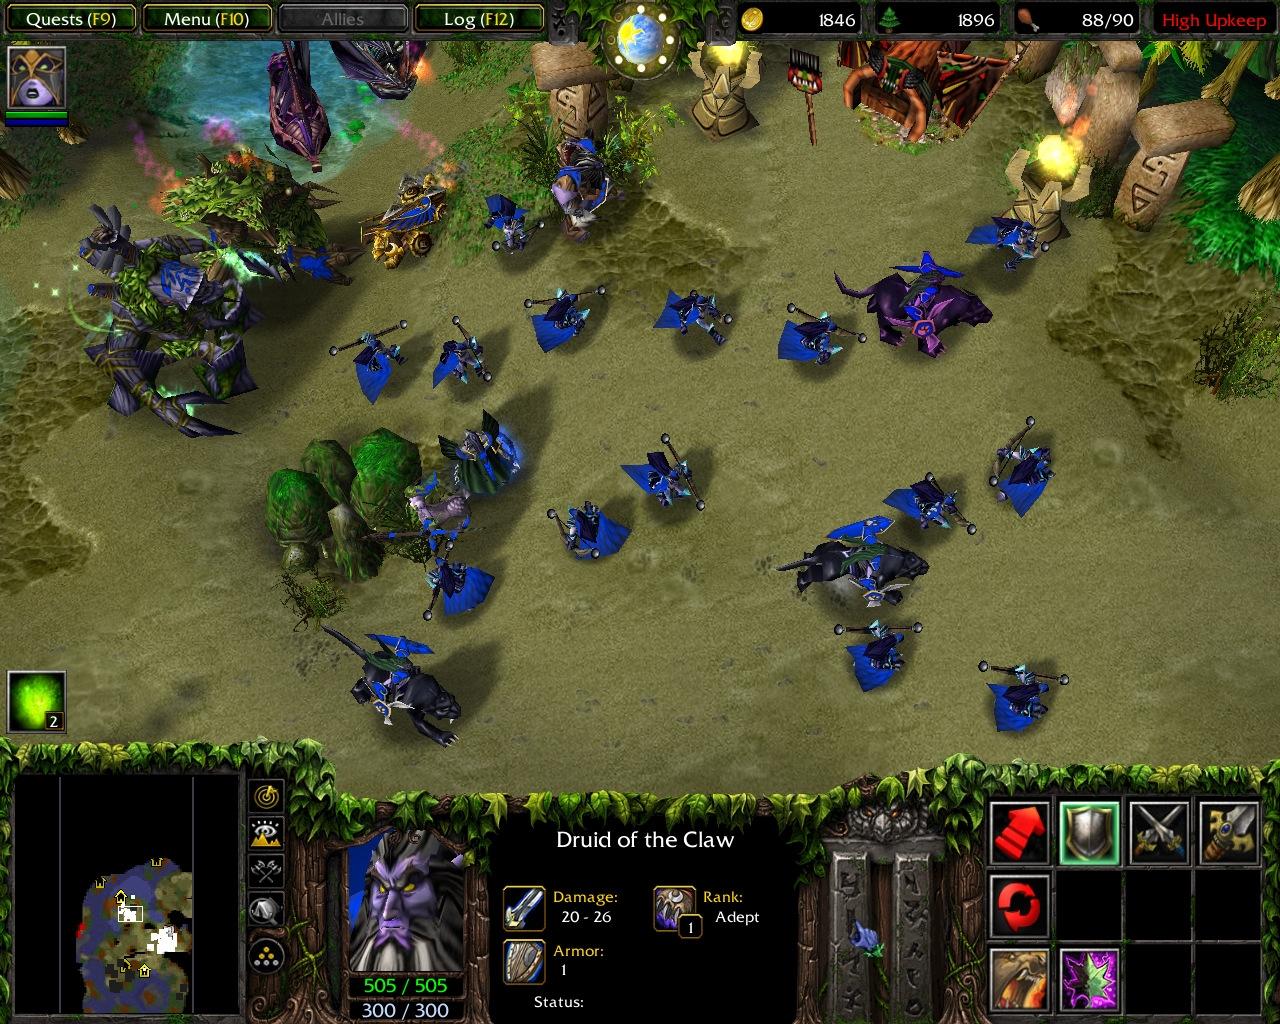 Warcraft 3 - Mac OS X : Warcraft III enfin compatible avec les processeurs Intel